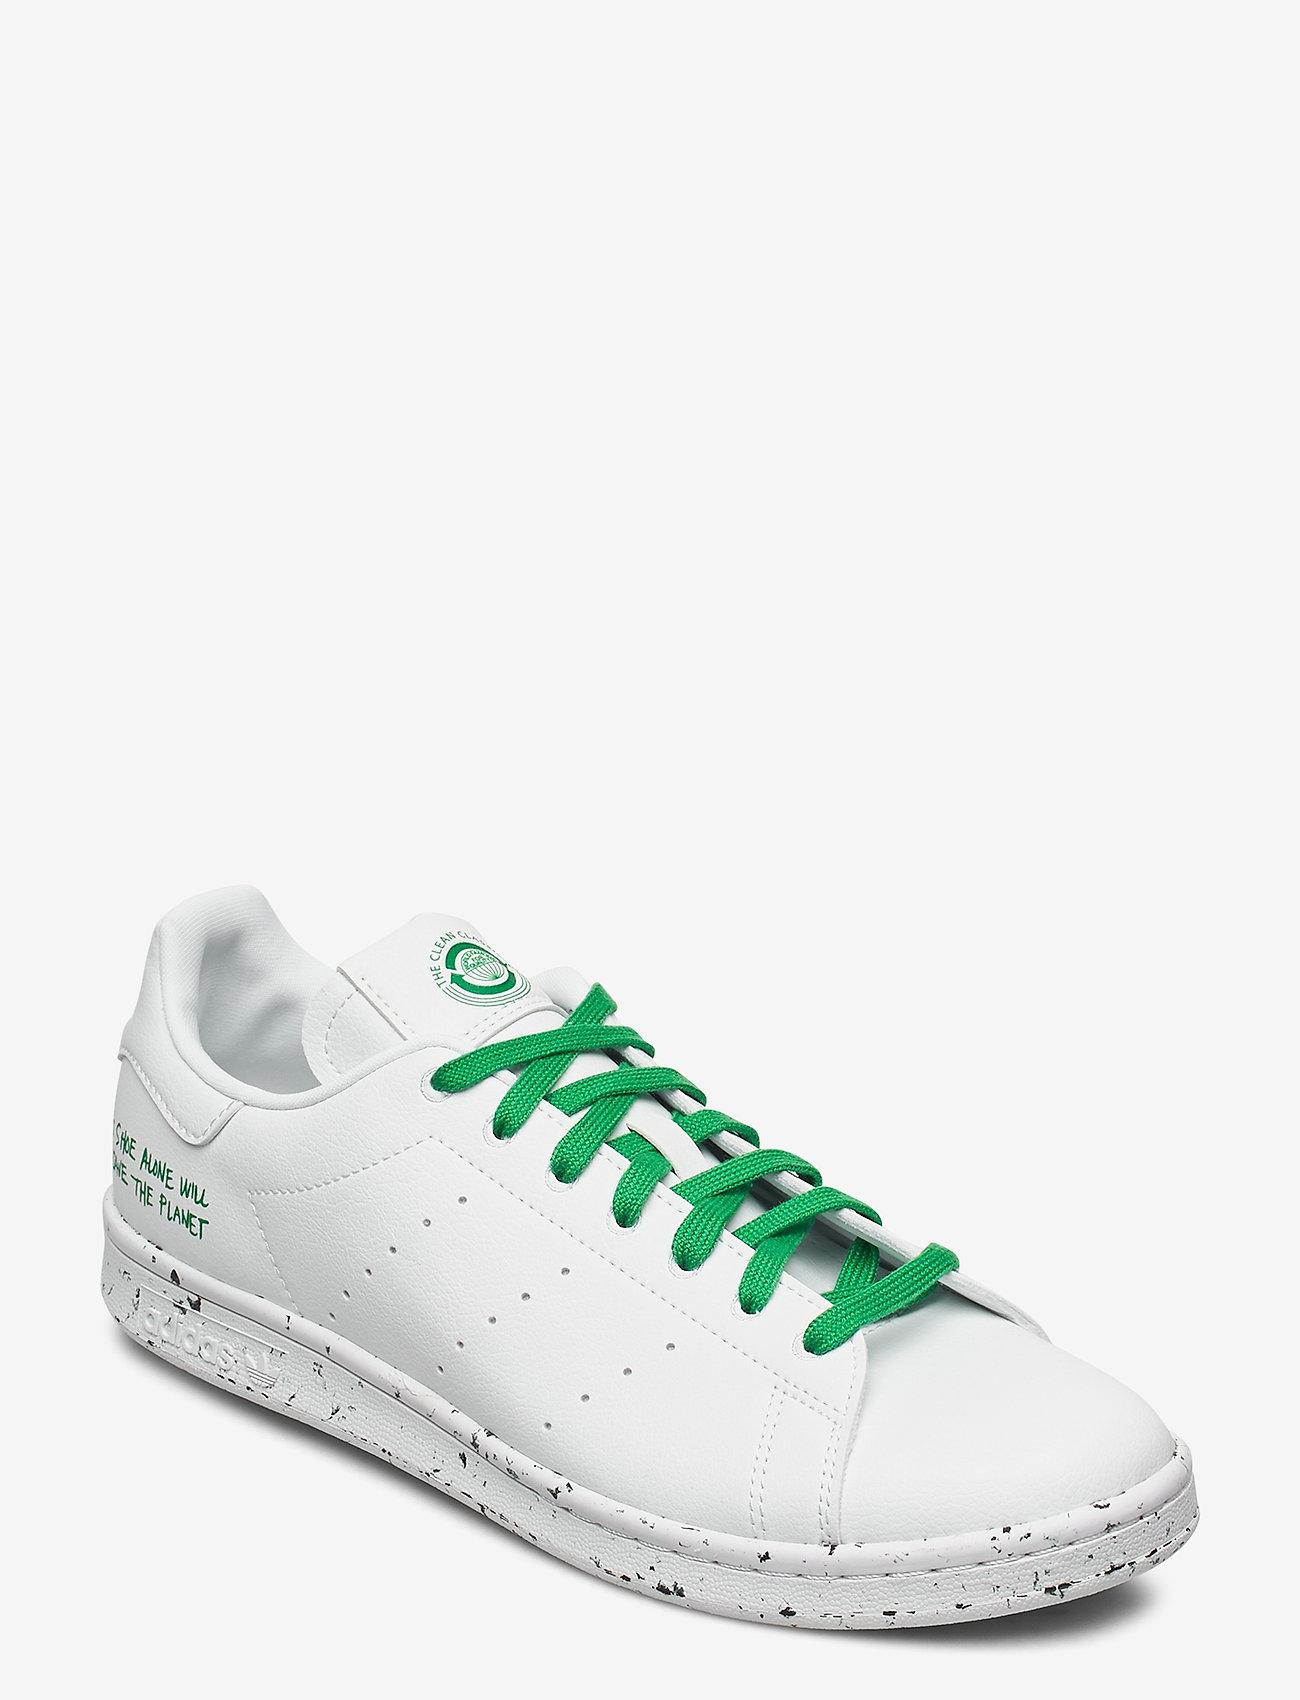 adidas Originals - STAN SMITH - lav ankel - ftwwht/ftwwht/green - 0